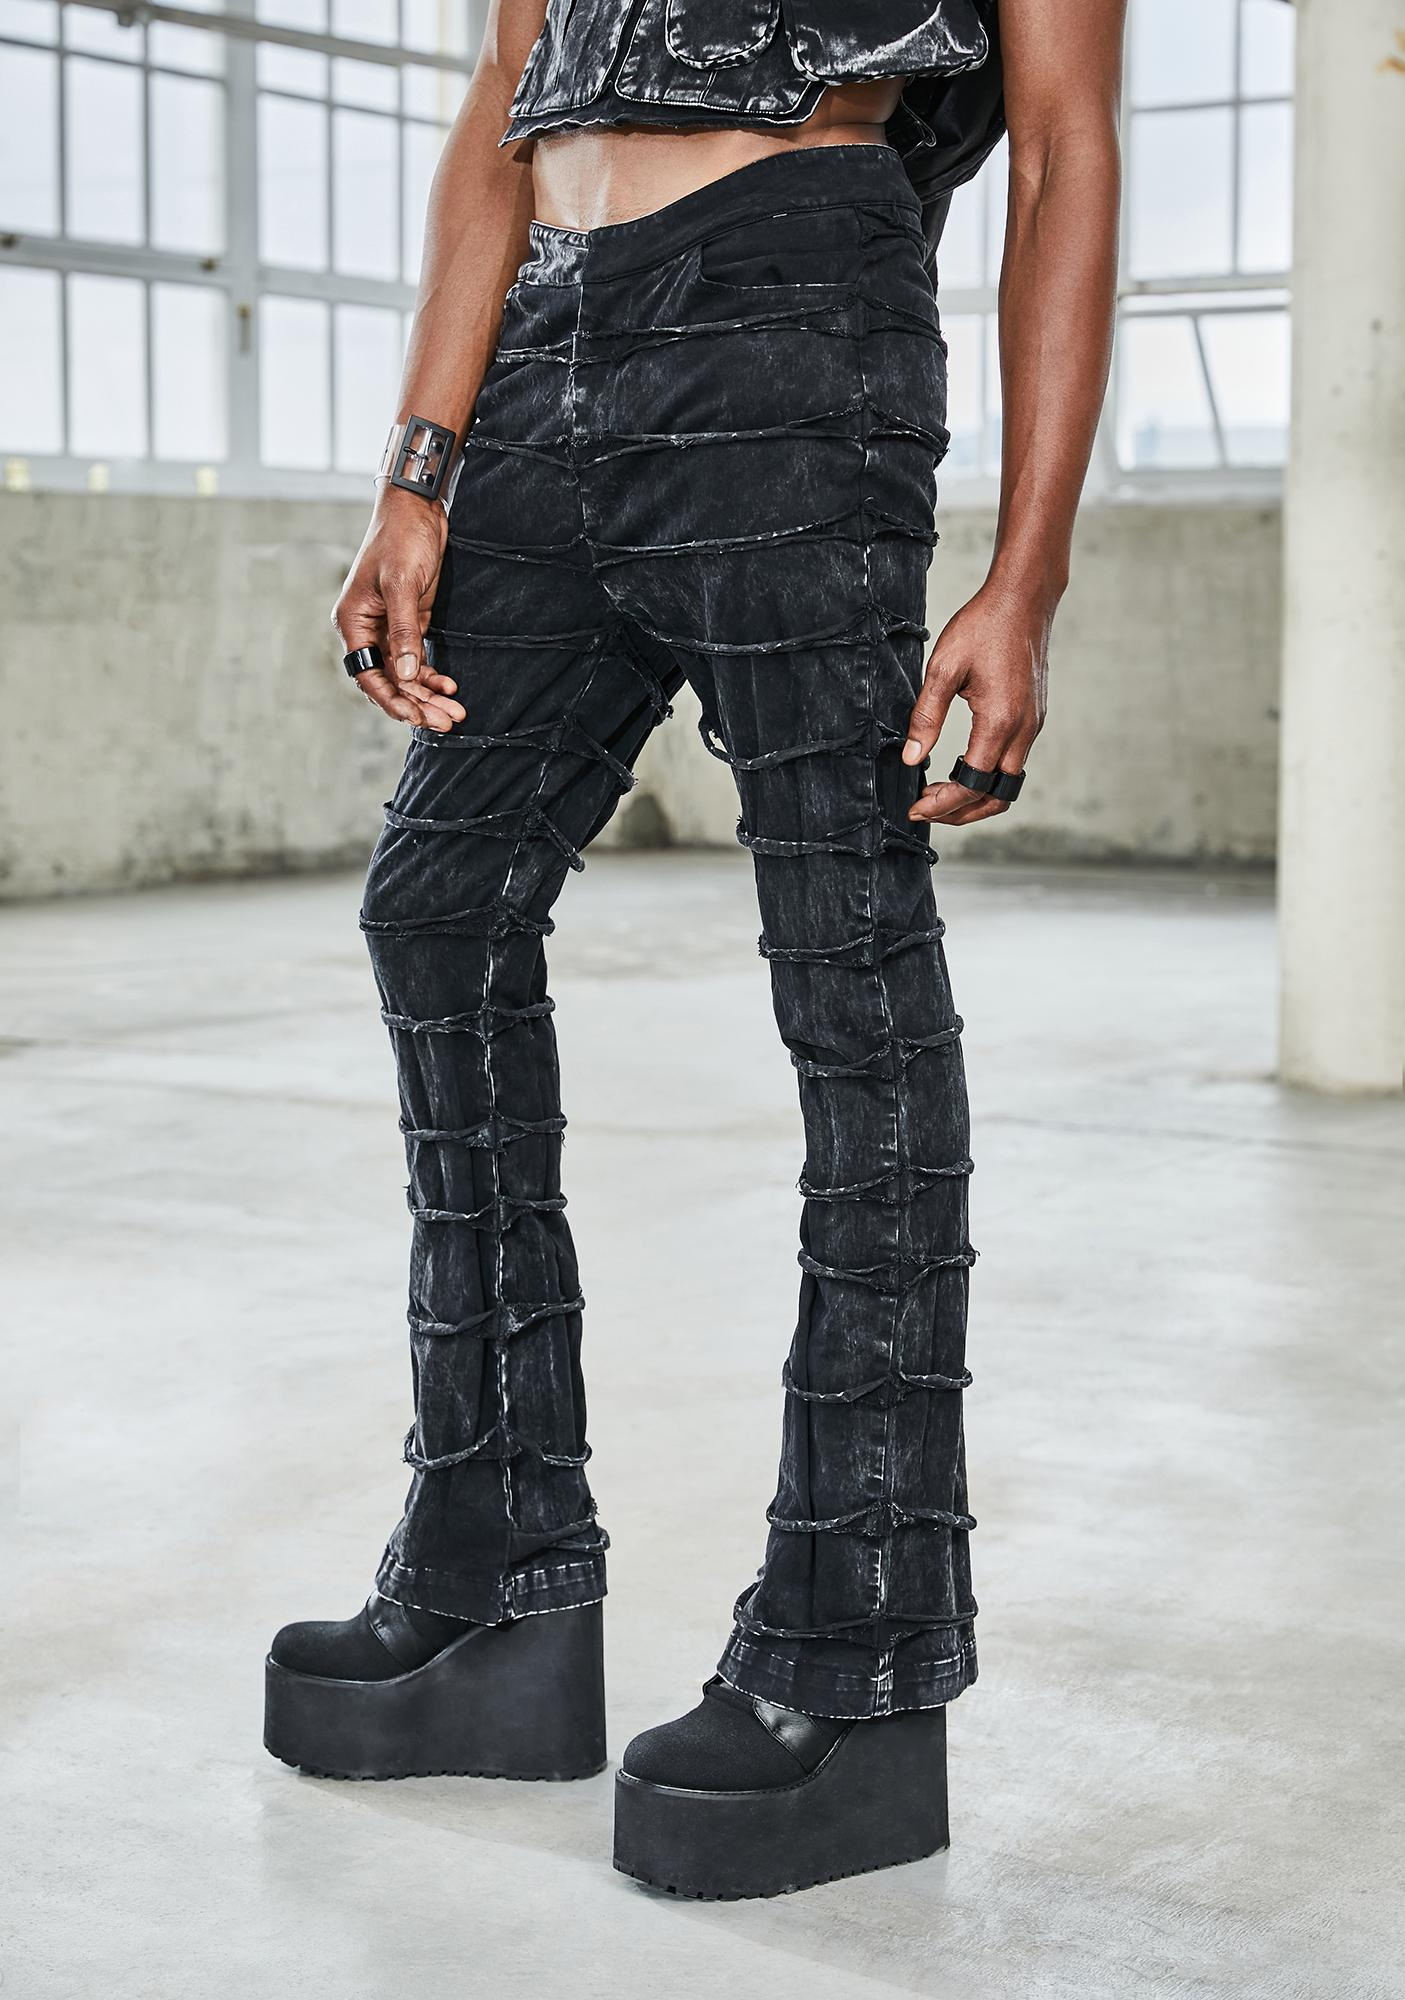 DARKER WAVS Bassline Distressed Patchwork Pants